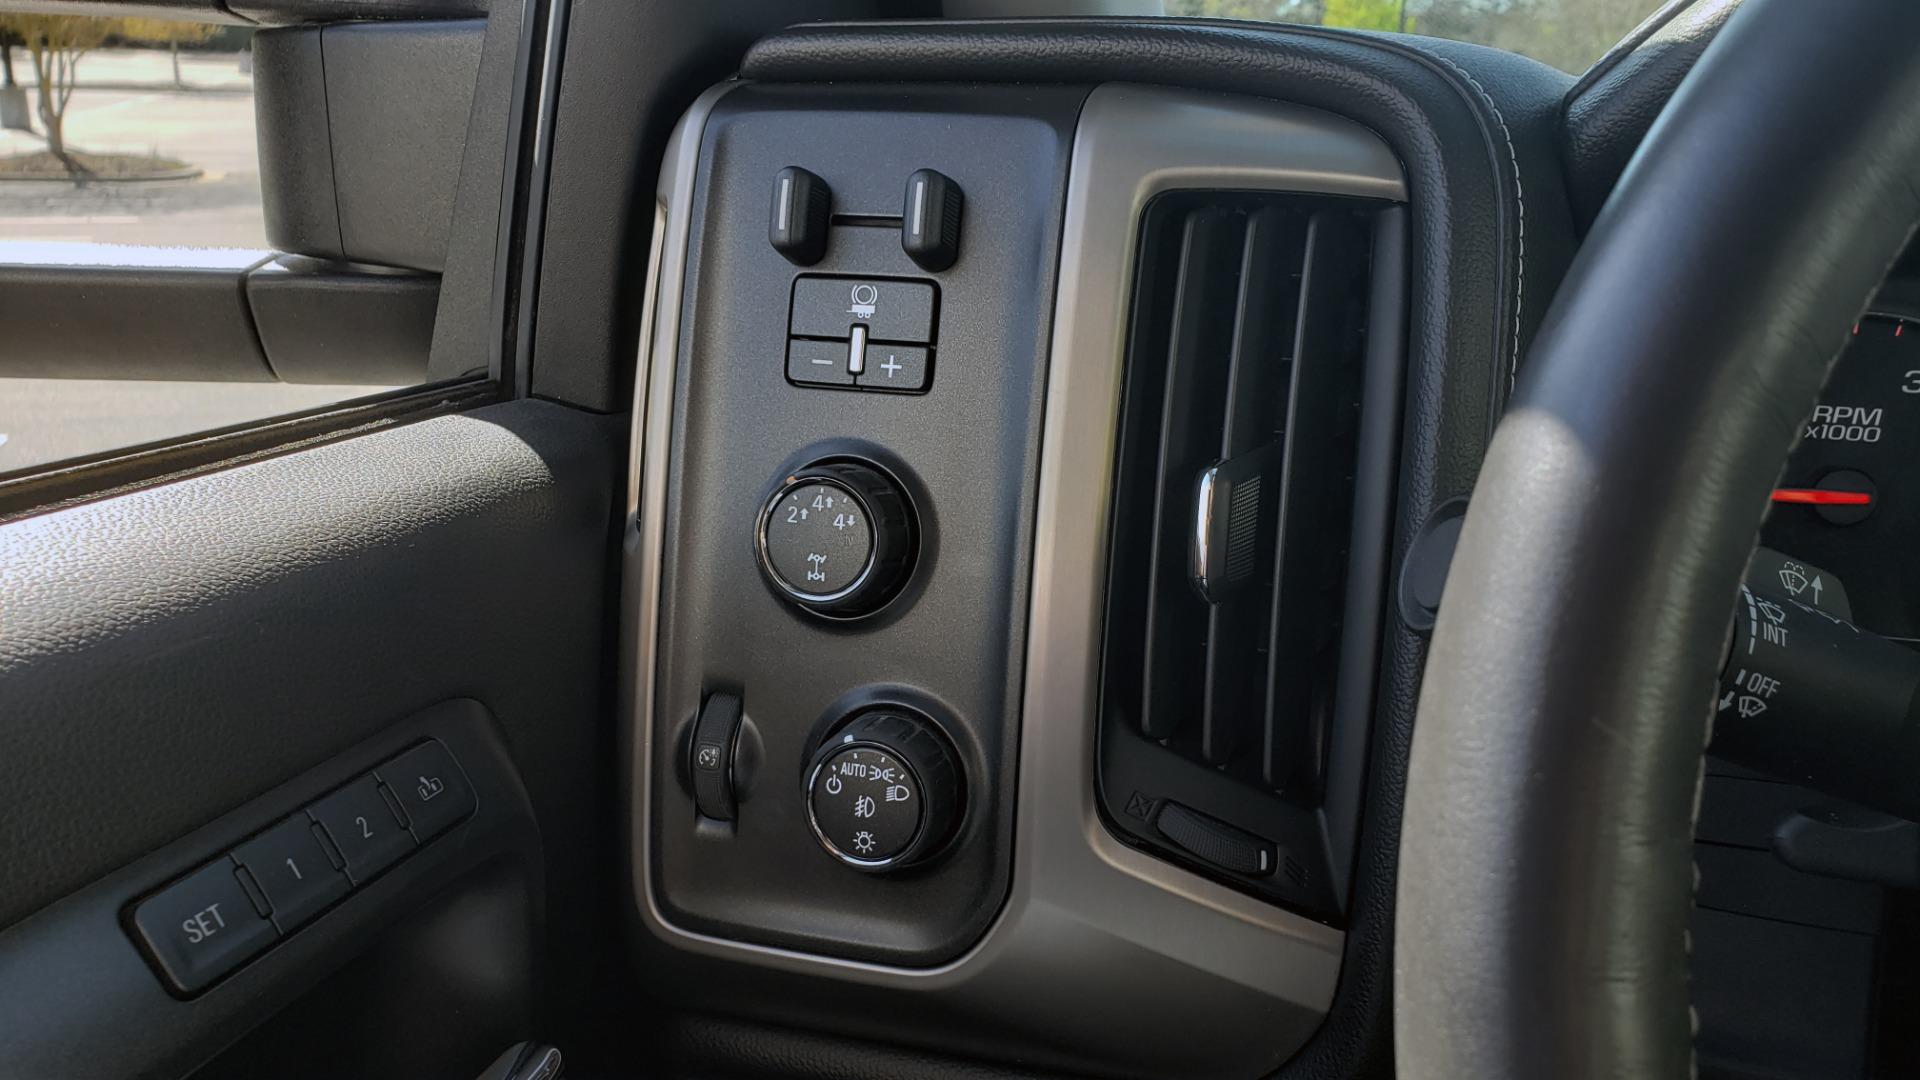 Used 2015 GMC SIERRA 2500HD DENALI 4WD CREWCAB / 6.6L DURAMAX / 6-SPD AUTO / NAV / BOSE for sale $50,995 at Formula Imports in Charlotte NC 28227 46